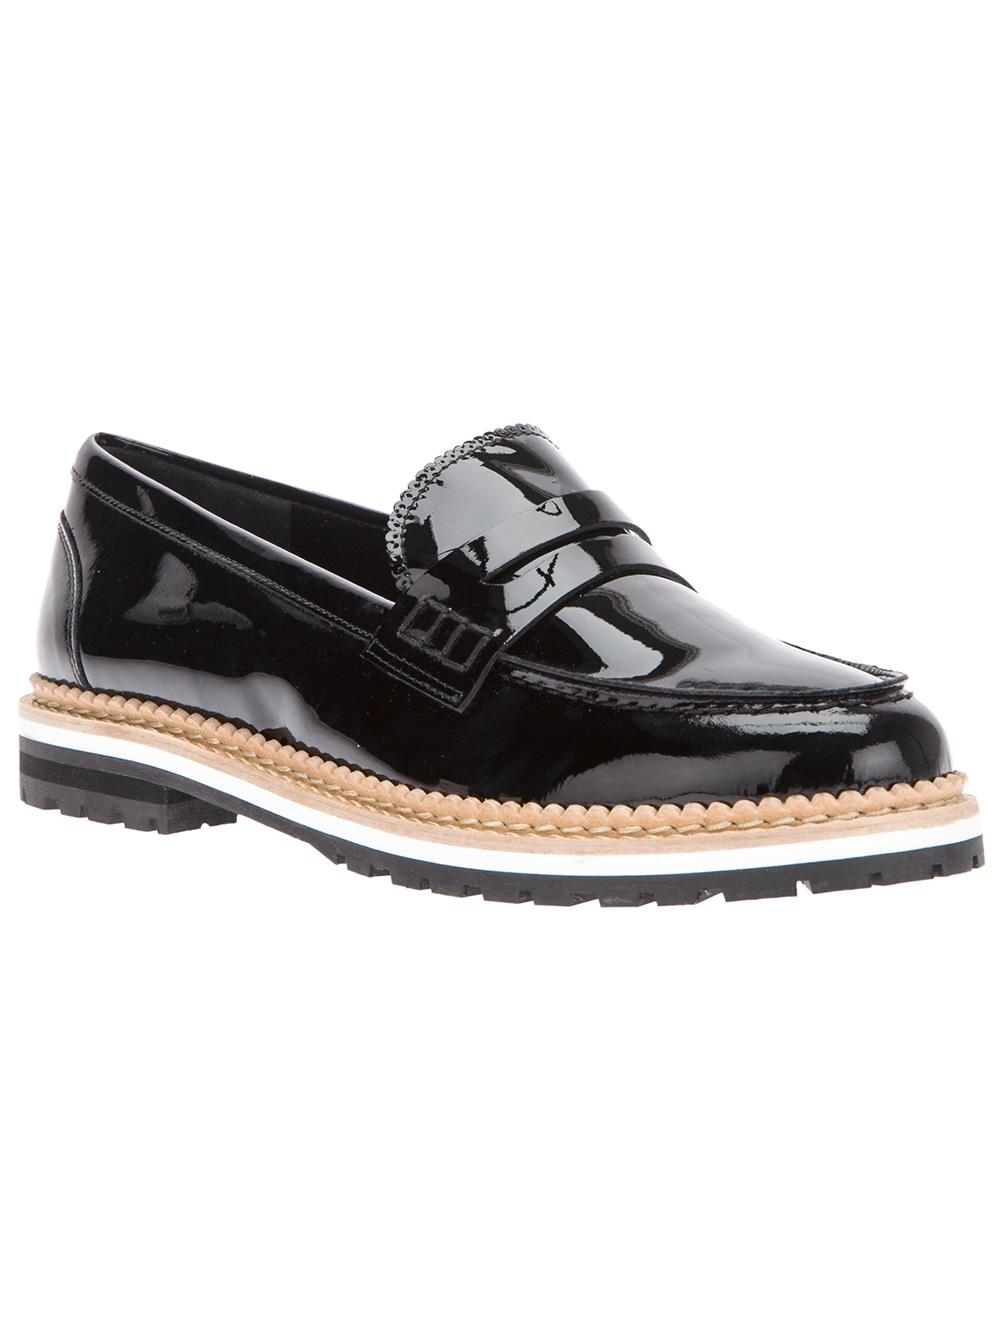 Chloe Grace Moretz Leather Slip On Shoes Vs Delphine